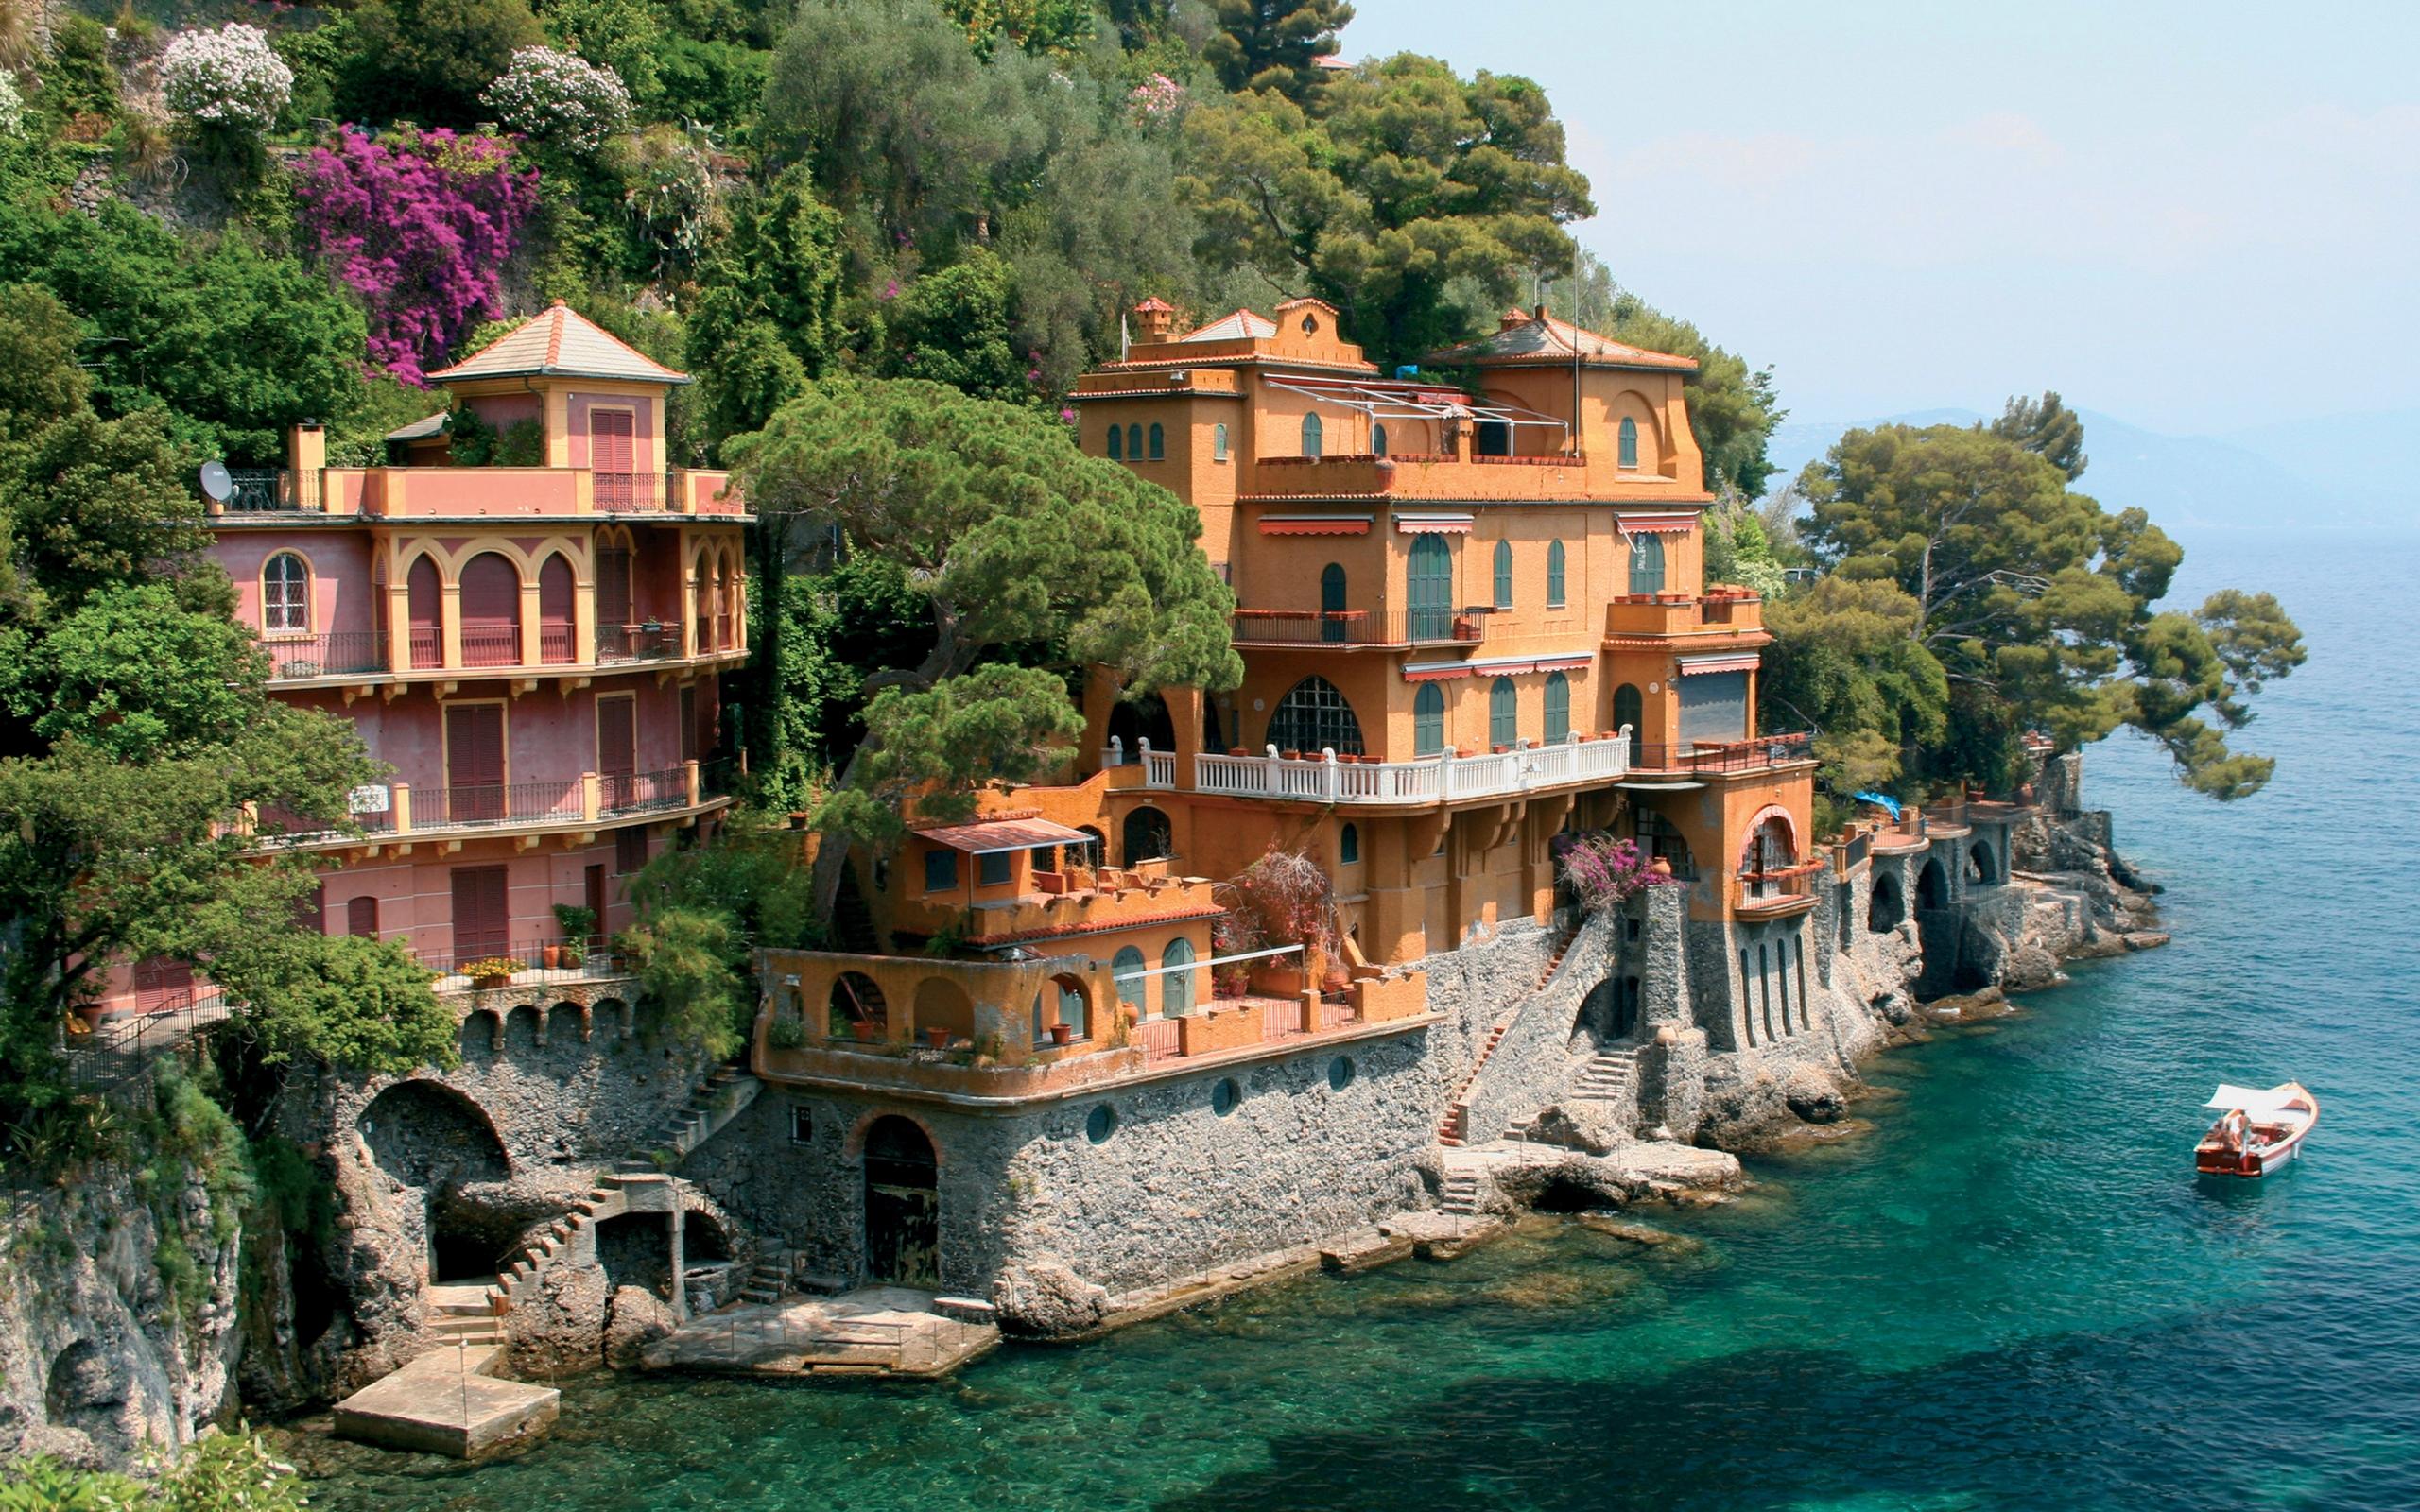 страны архитектура природа море Италия бесплатно